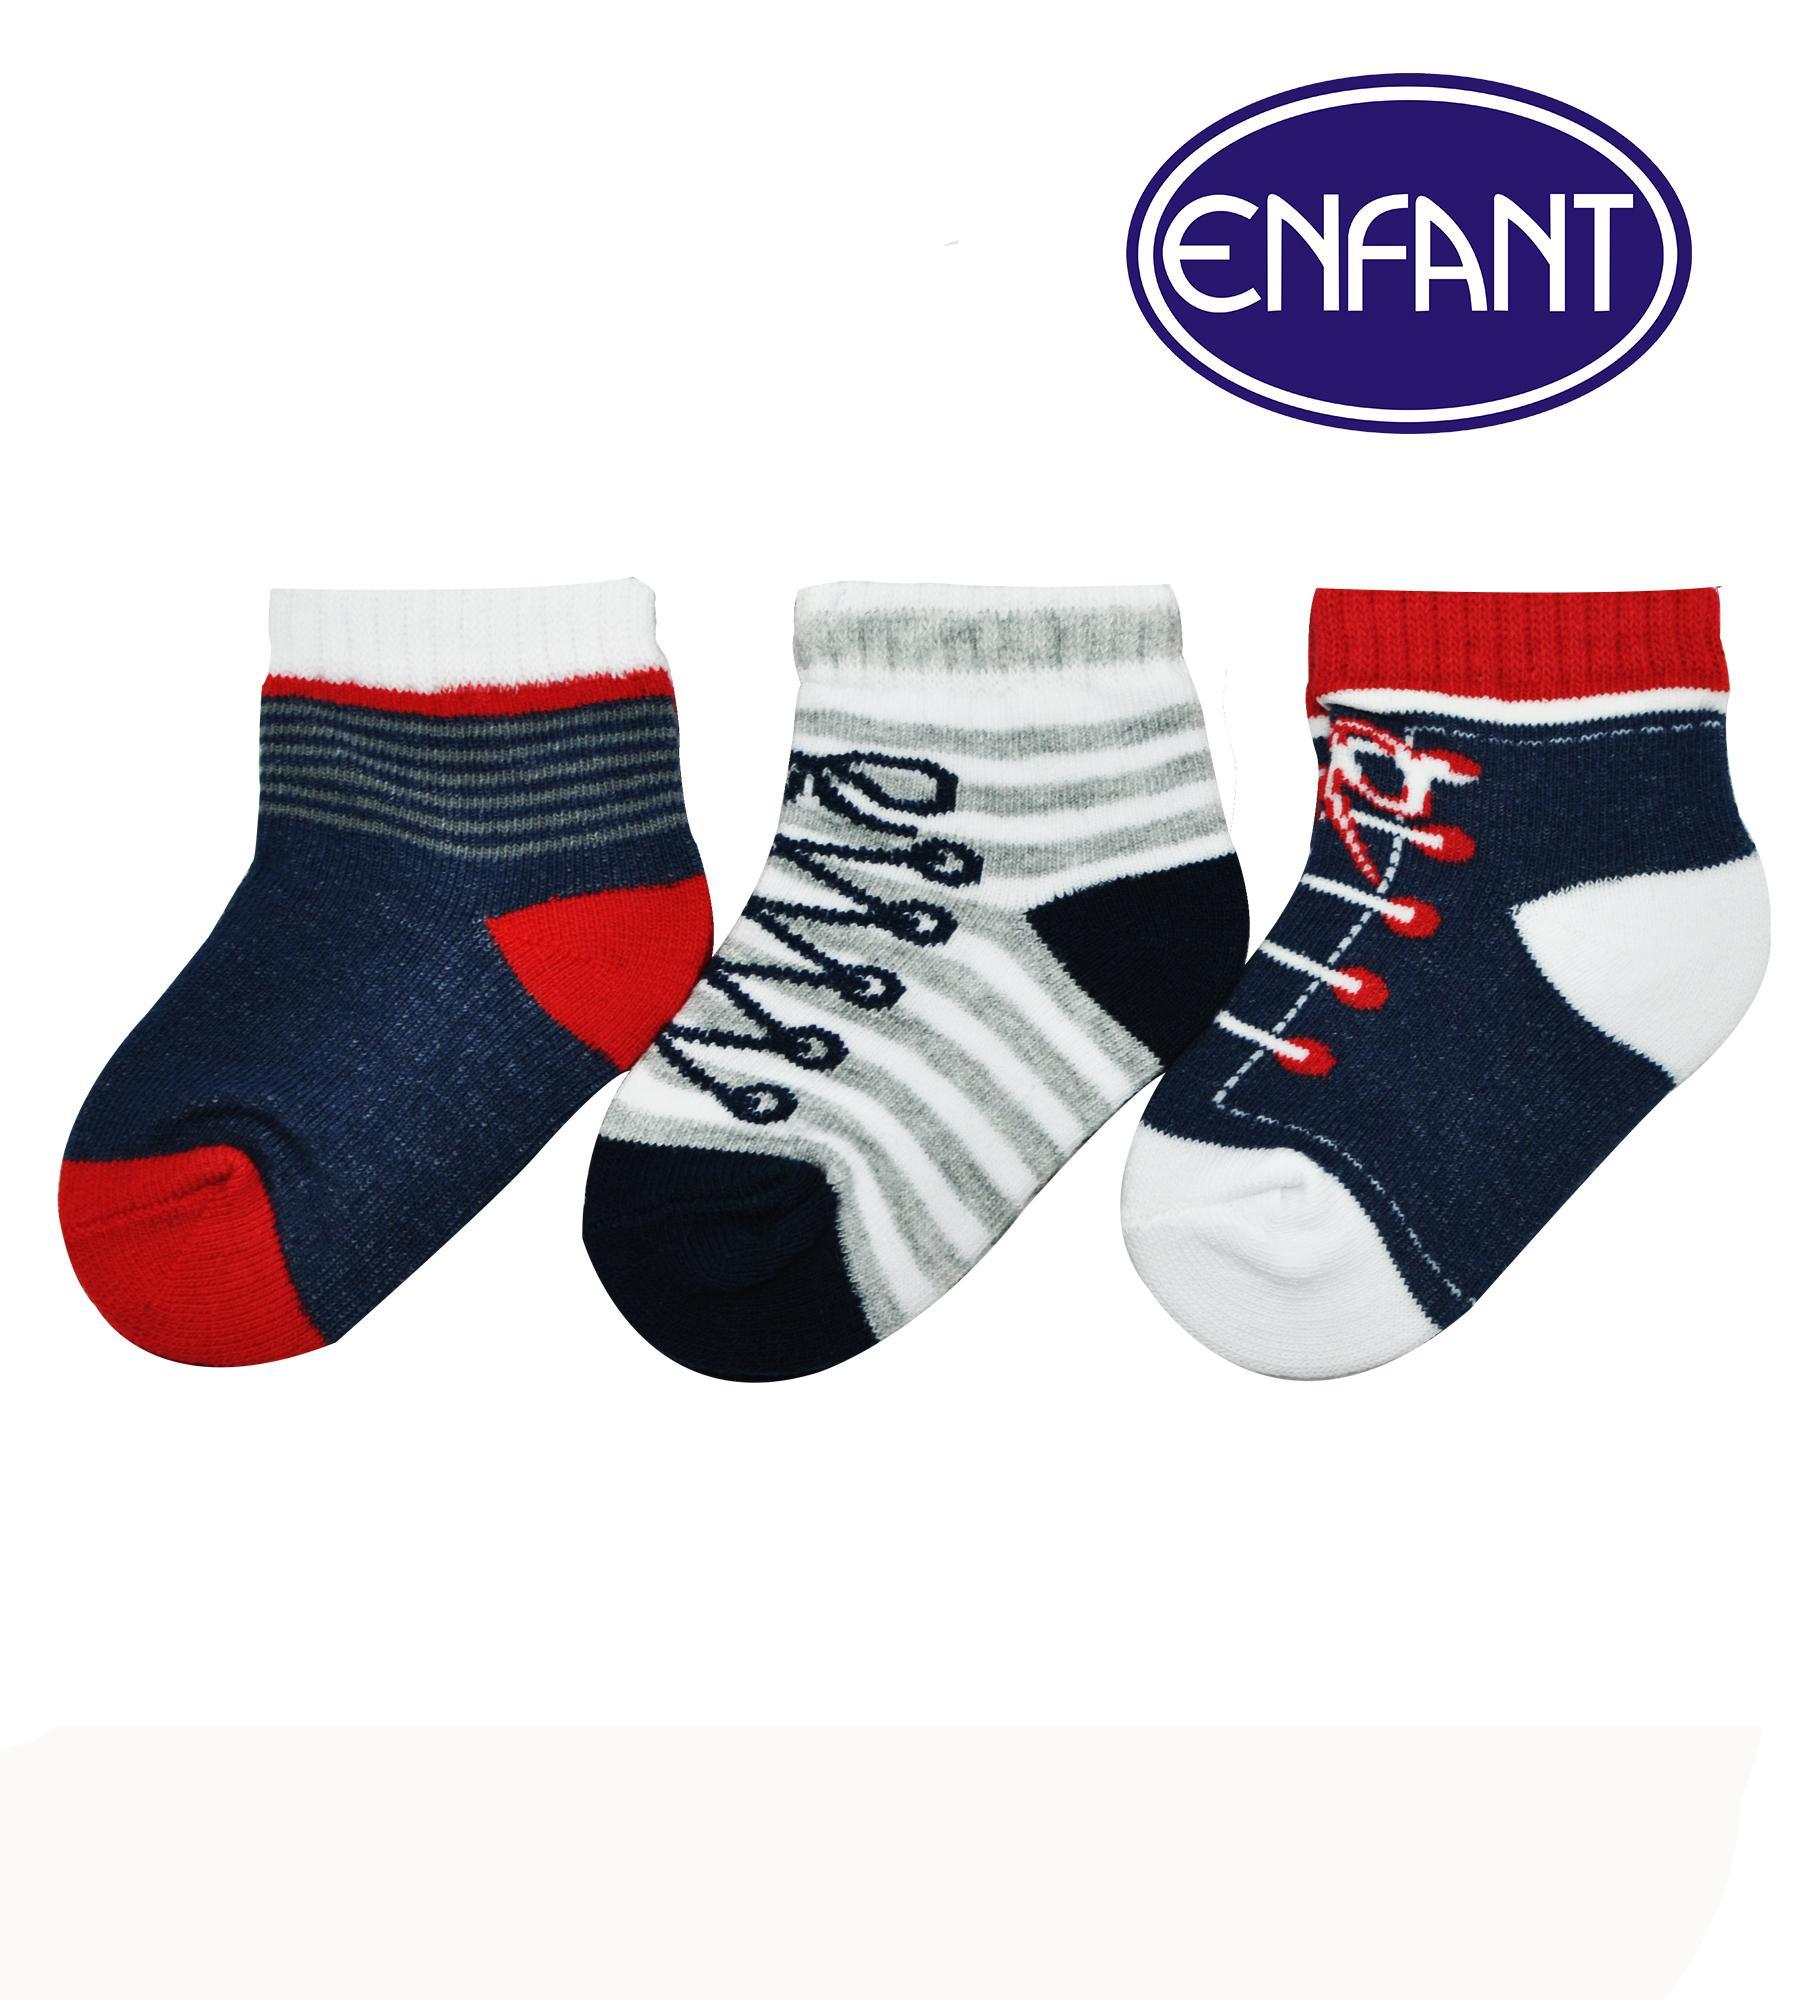 Boys Socks For Sale Baby Boys Socks Online Brands Prices